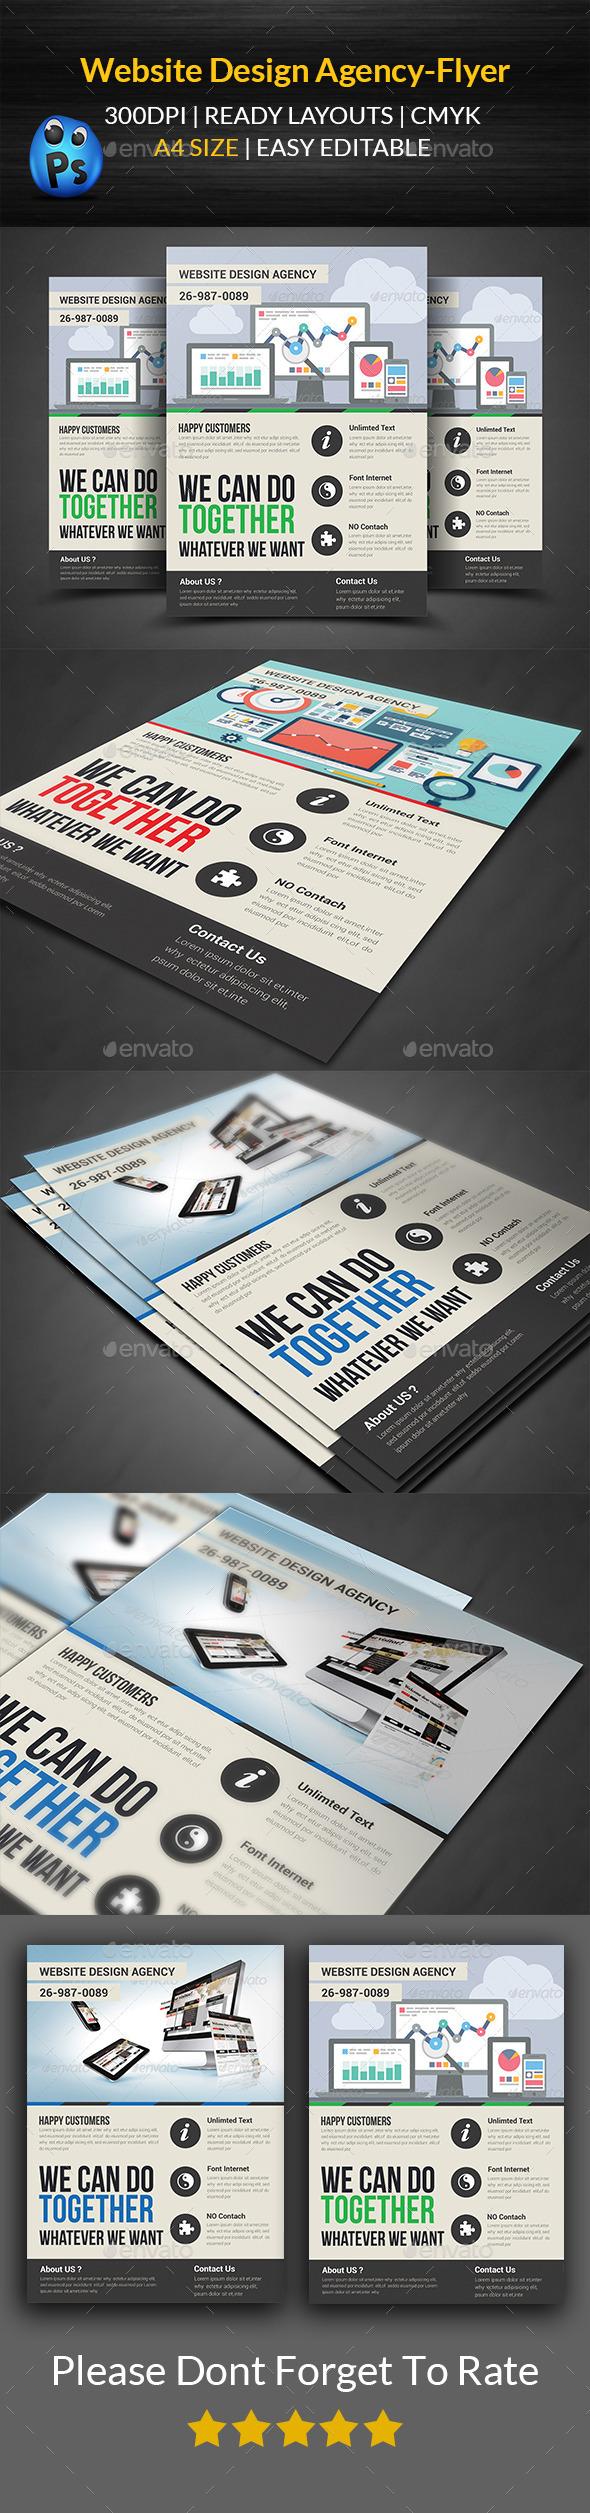 Website Design Agency Flyer Print Templates - Flyers Print Templates